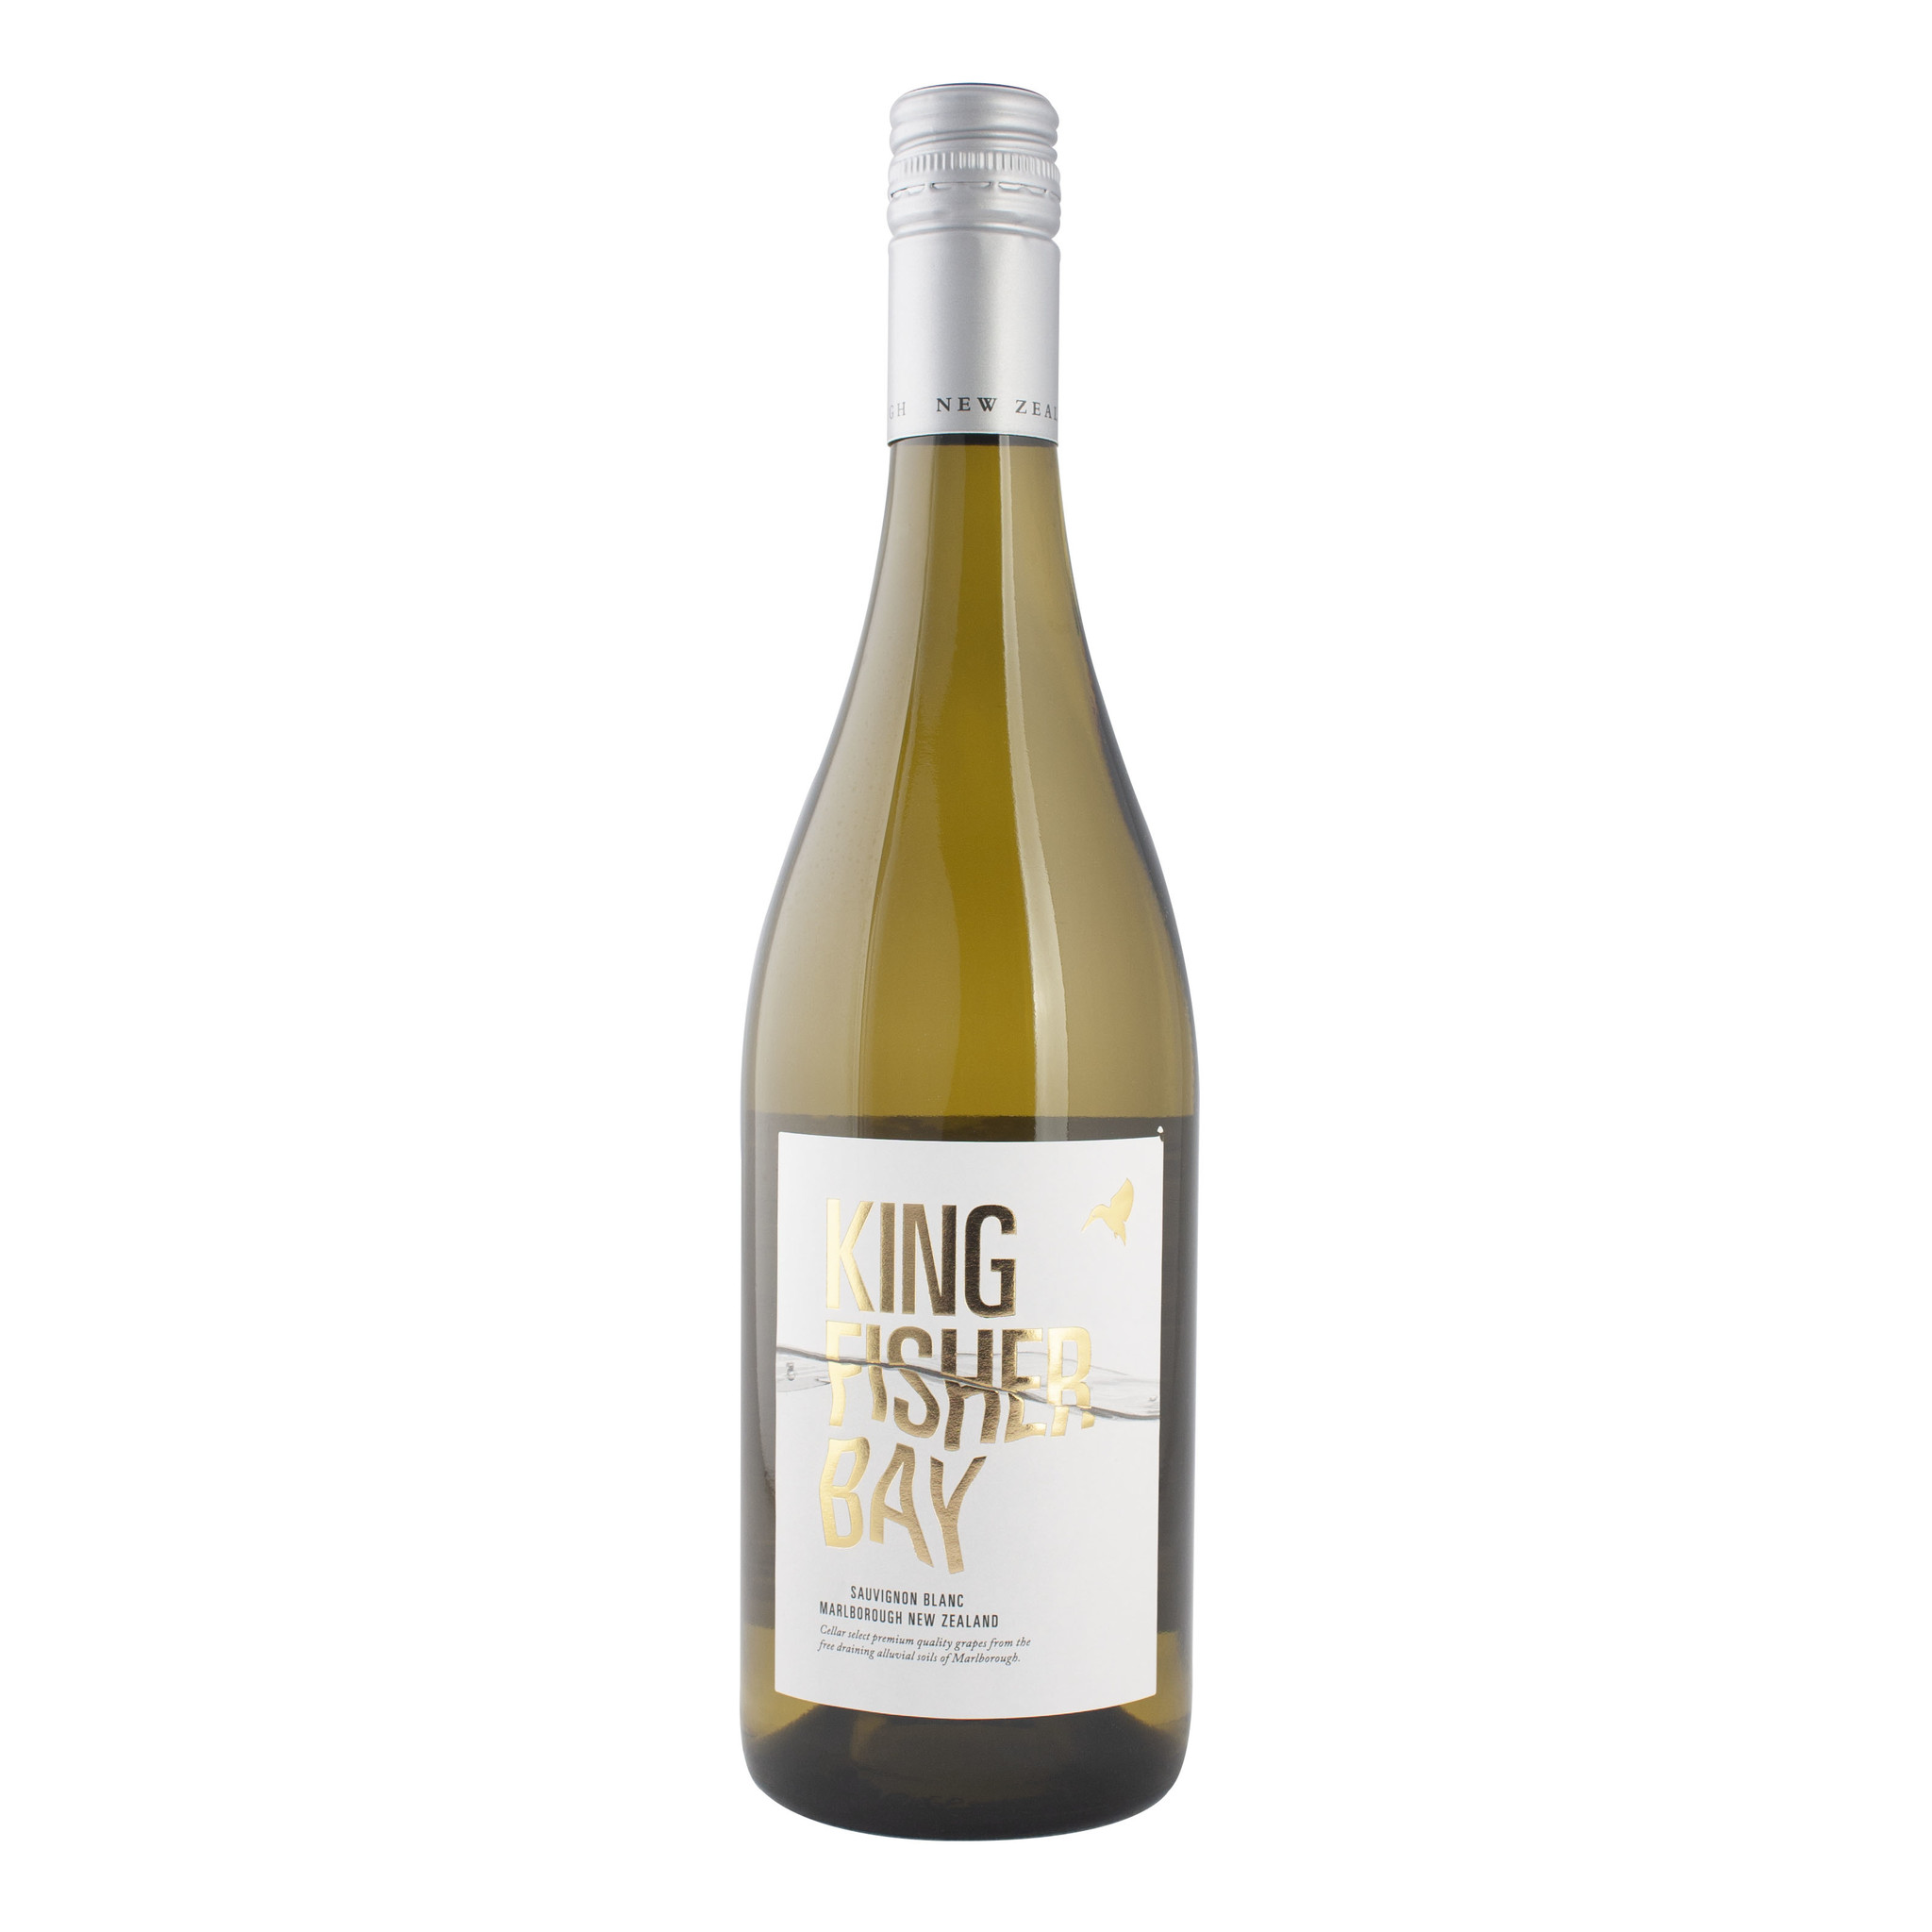 Kingfisher Bay Sauvignon Blanc Marlborough 2019